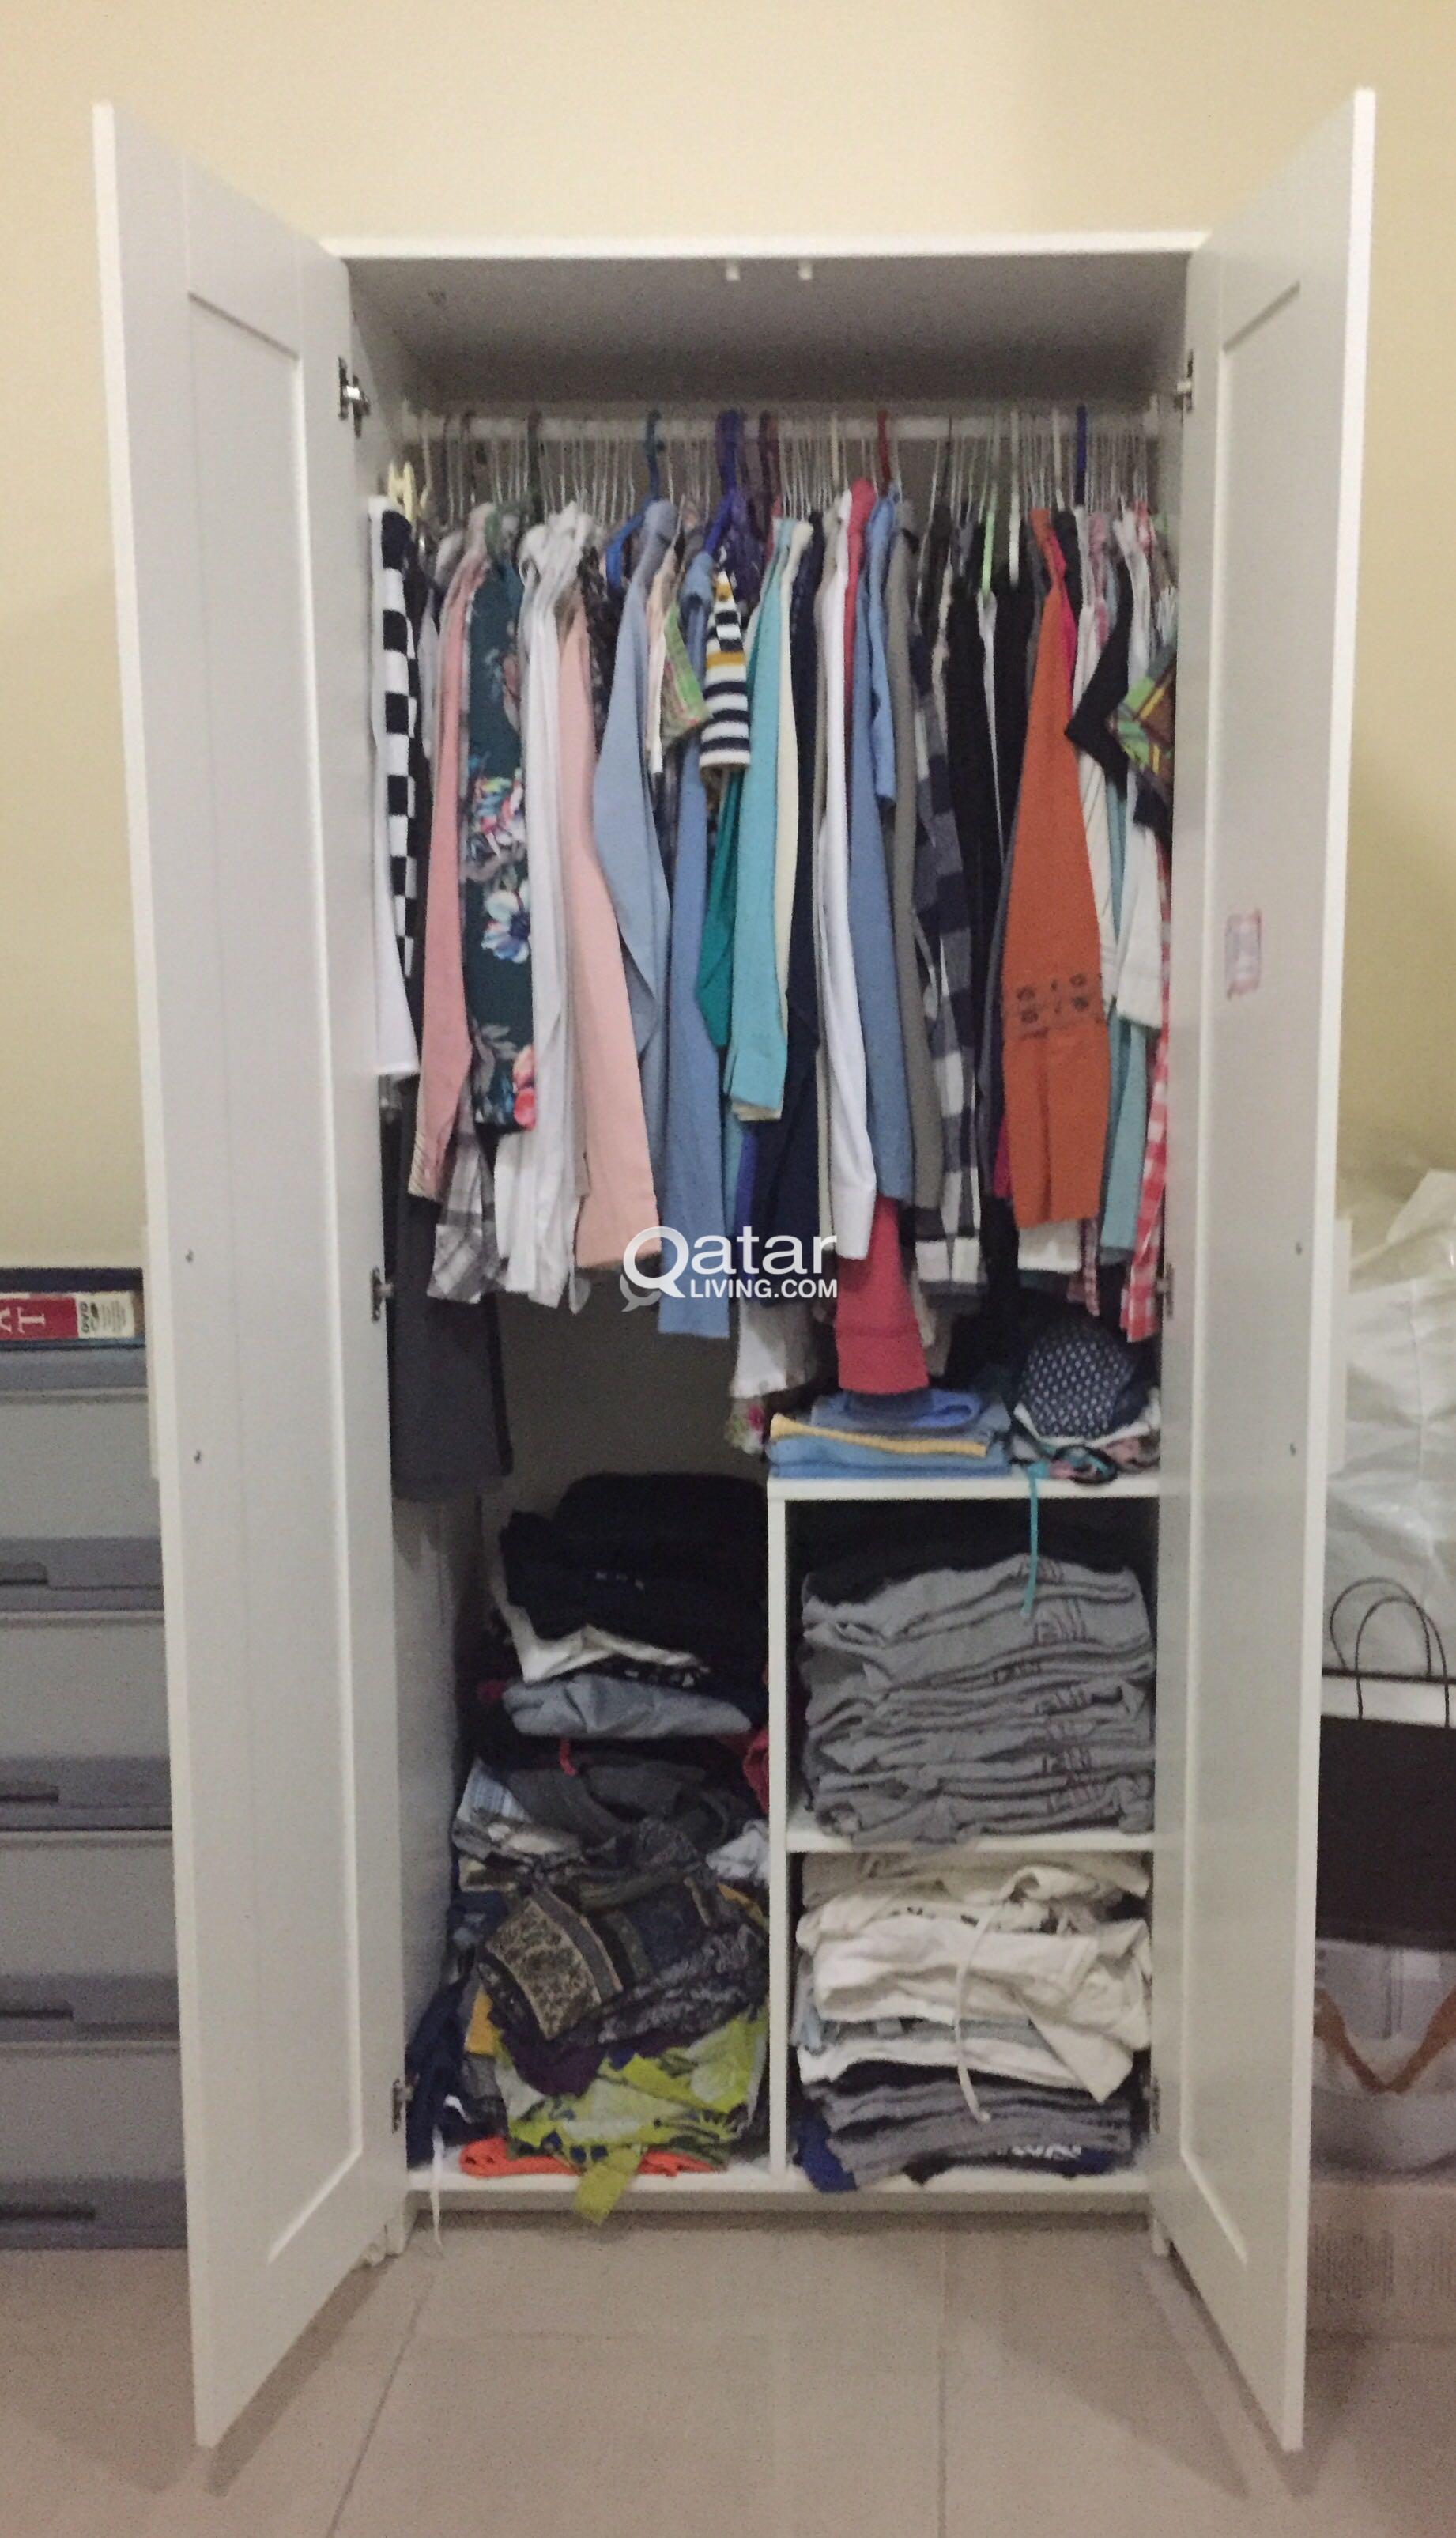 IKEA-BRIMNES WARDROBE/2door   Qatar Living